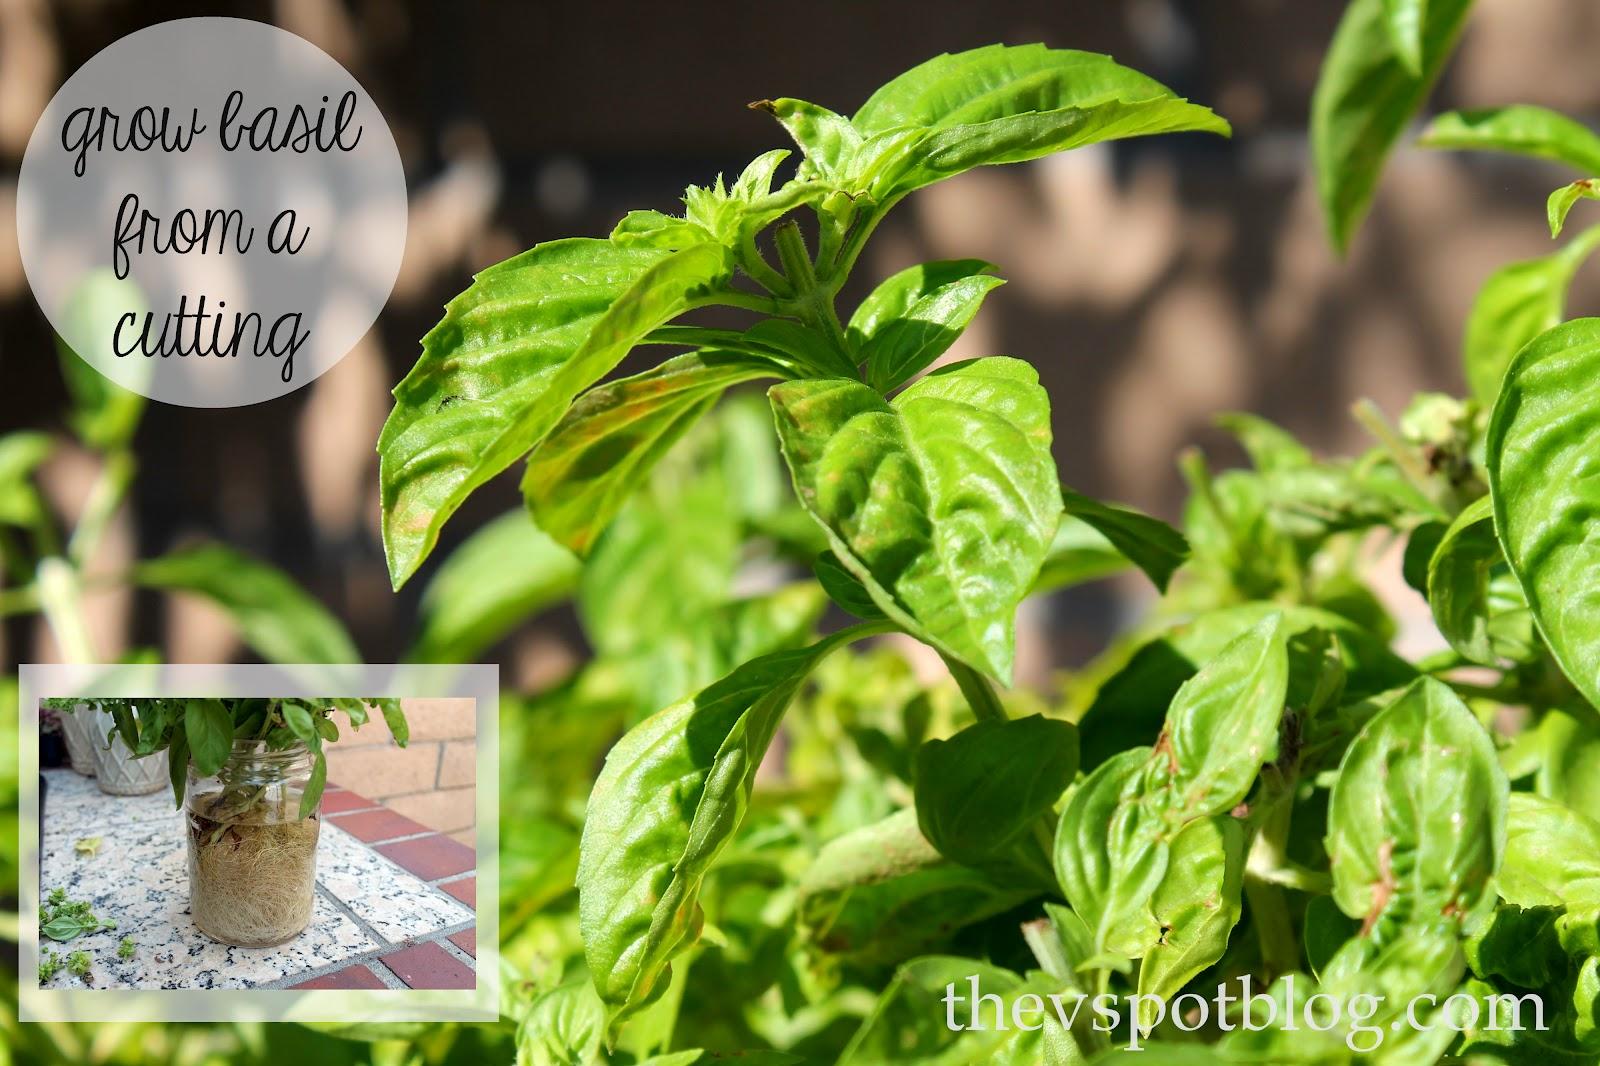 easy garden tip planting basil from cuttings the v spot. Black Bedroom Furniture Sets. Home Design Ideas